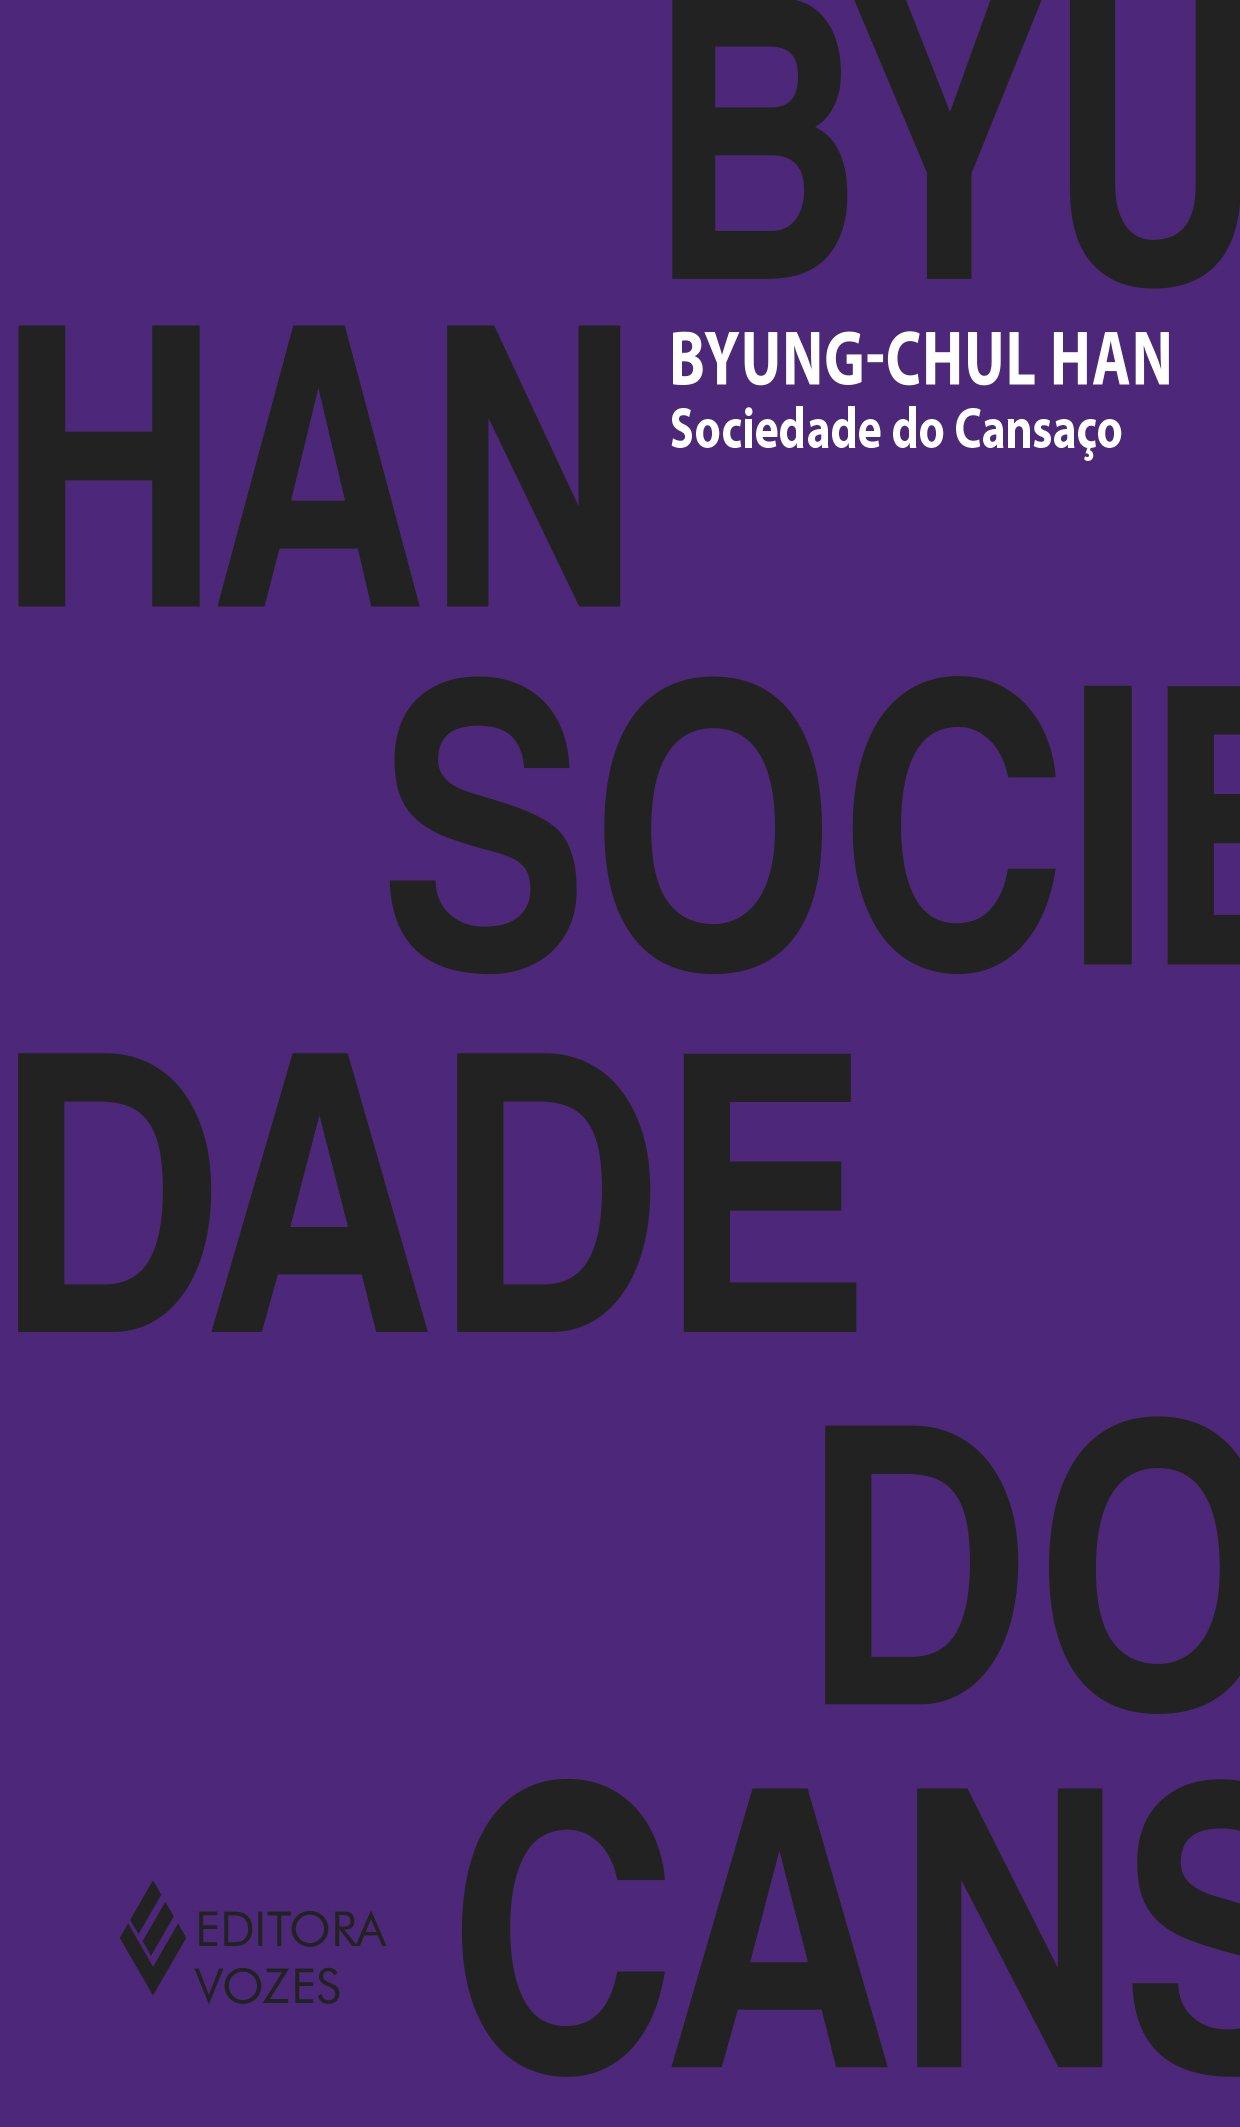 Sociedade do cansaço - 9788532649966 - Livros na Amazon Brasil